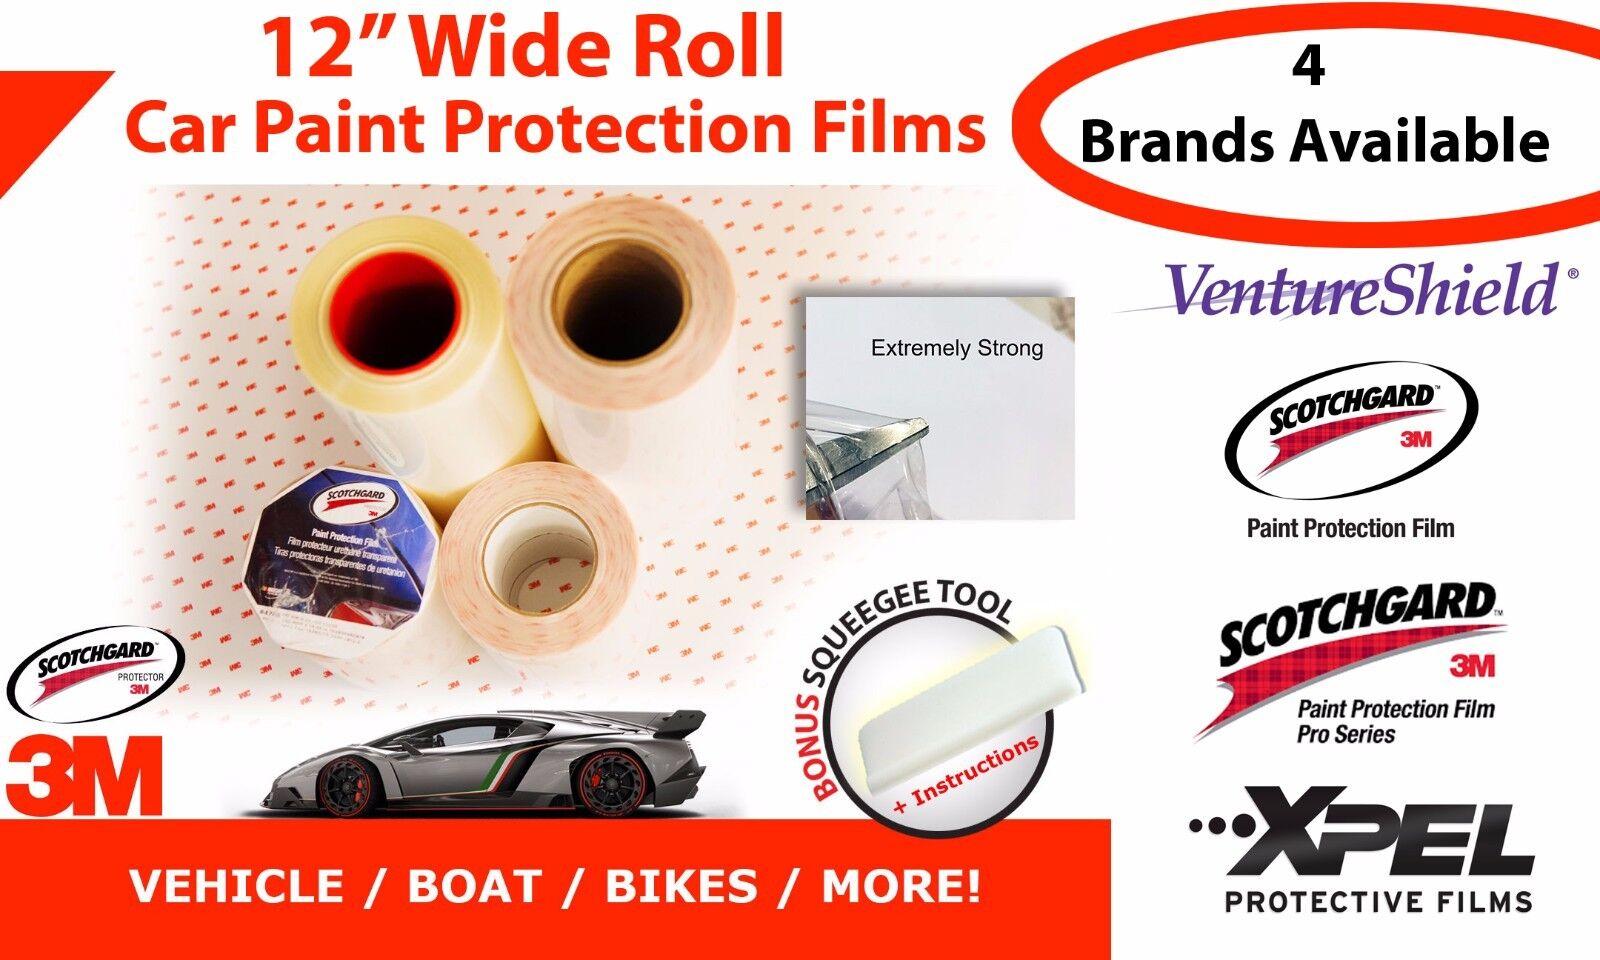 12  Wide VentureShield - Scotchgard - 3M Pro Series - Xpel Car Paint Prossoection